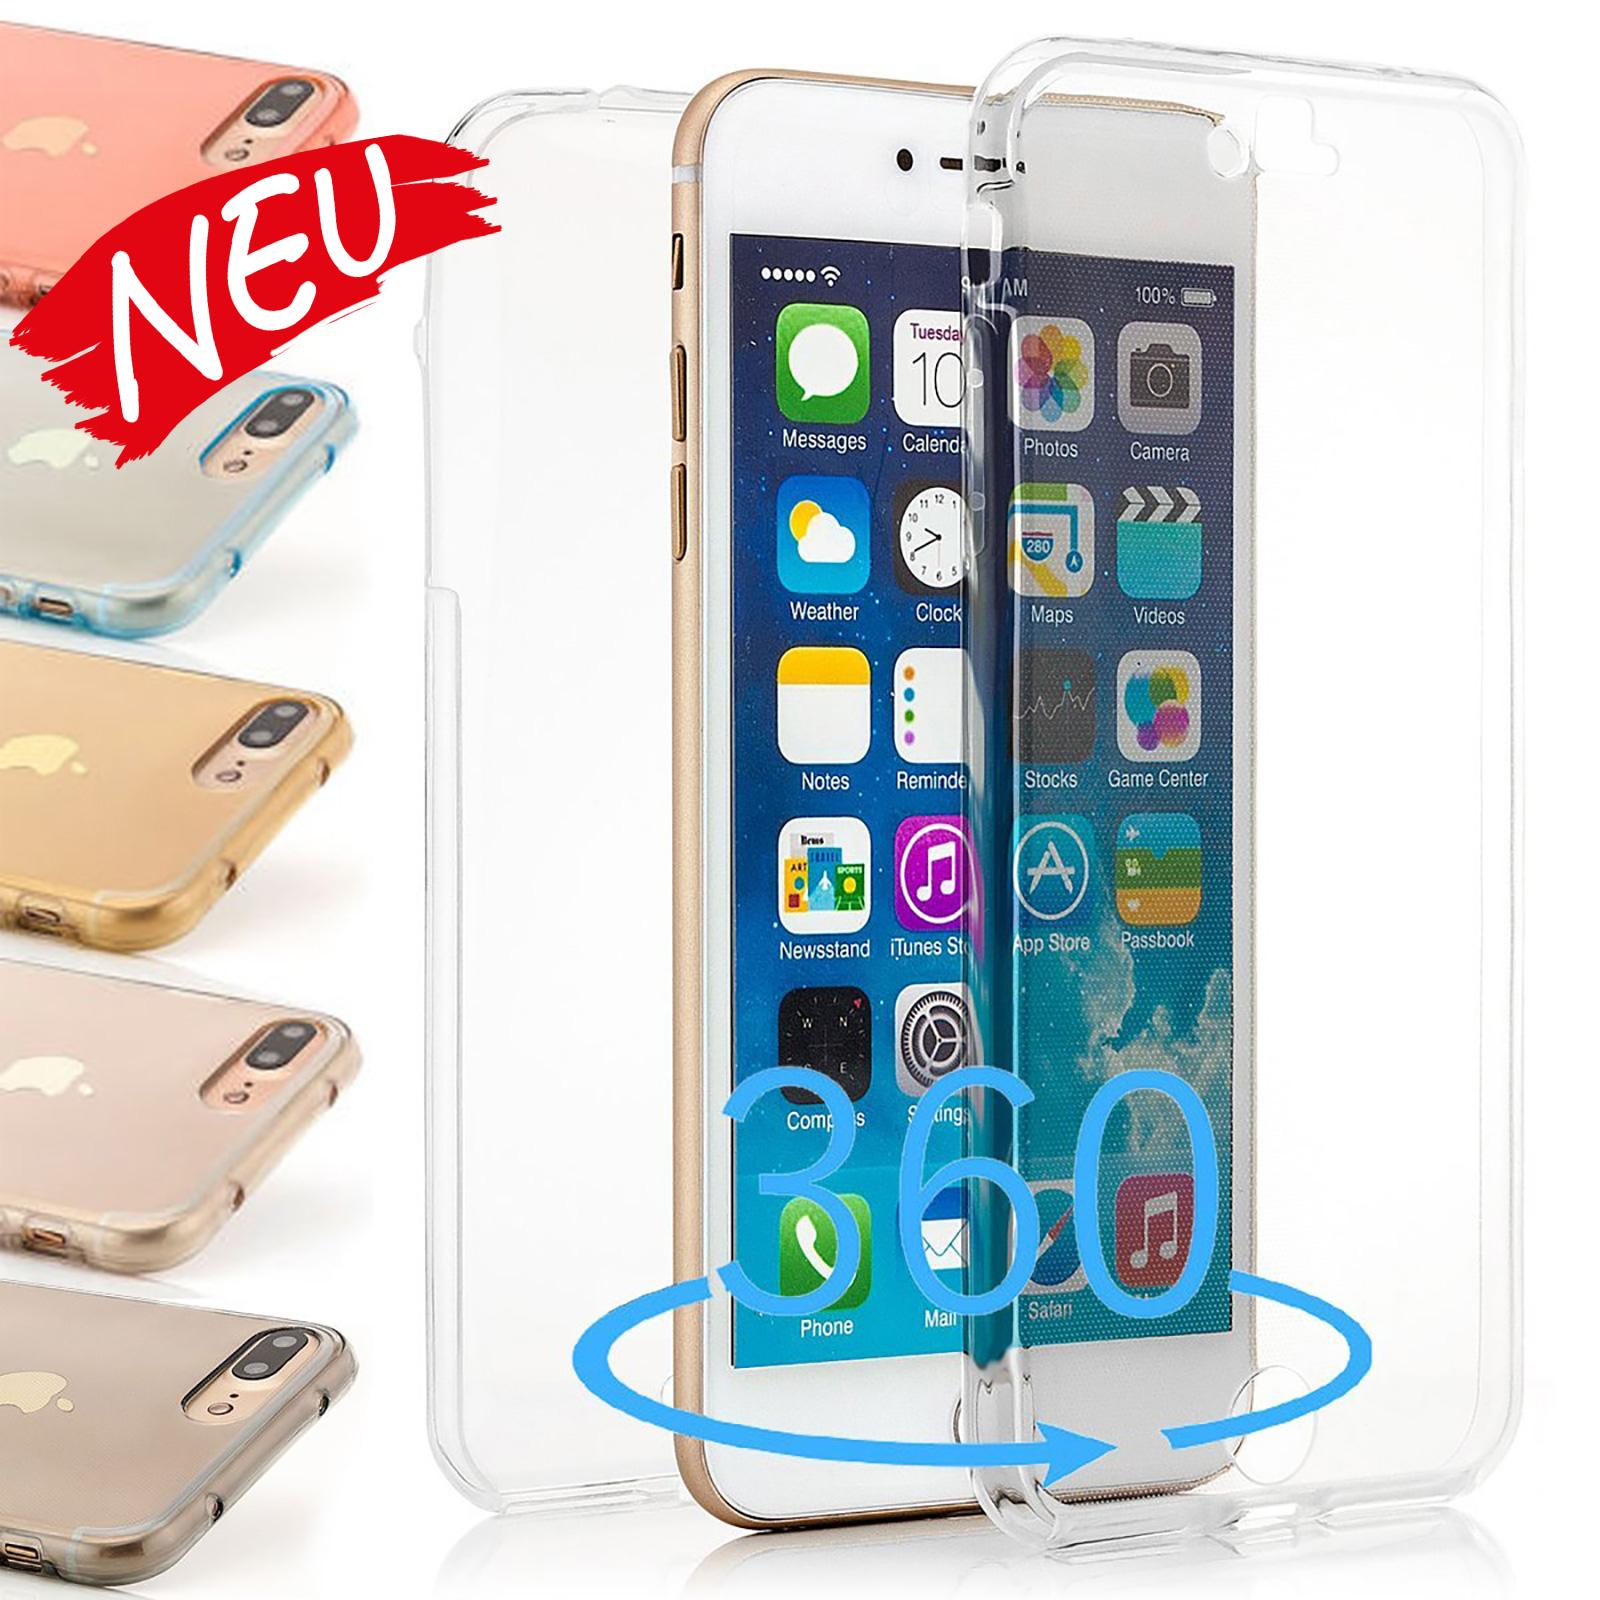 dünne TPU Silikon Schutzhülle für iPhone  - transparent